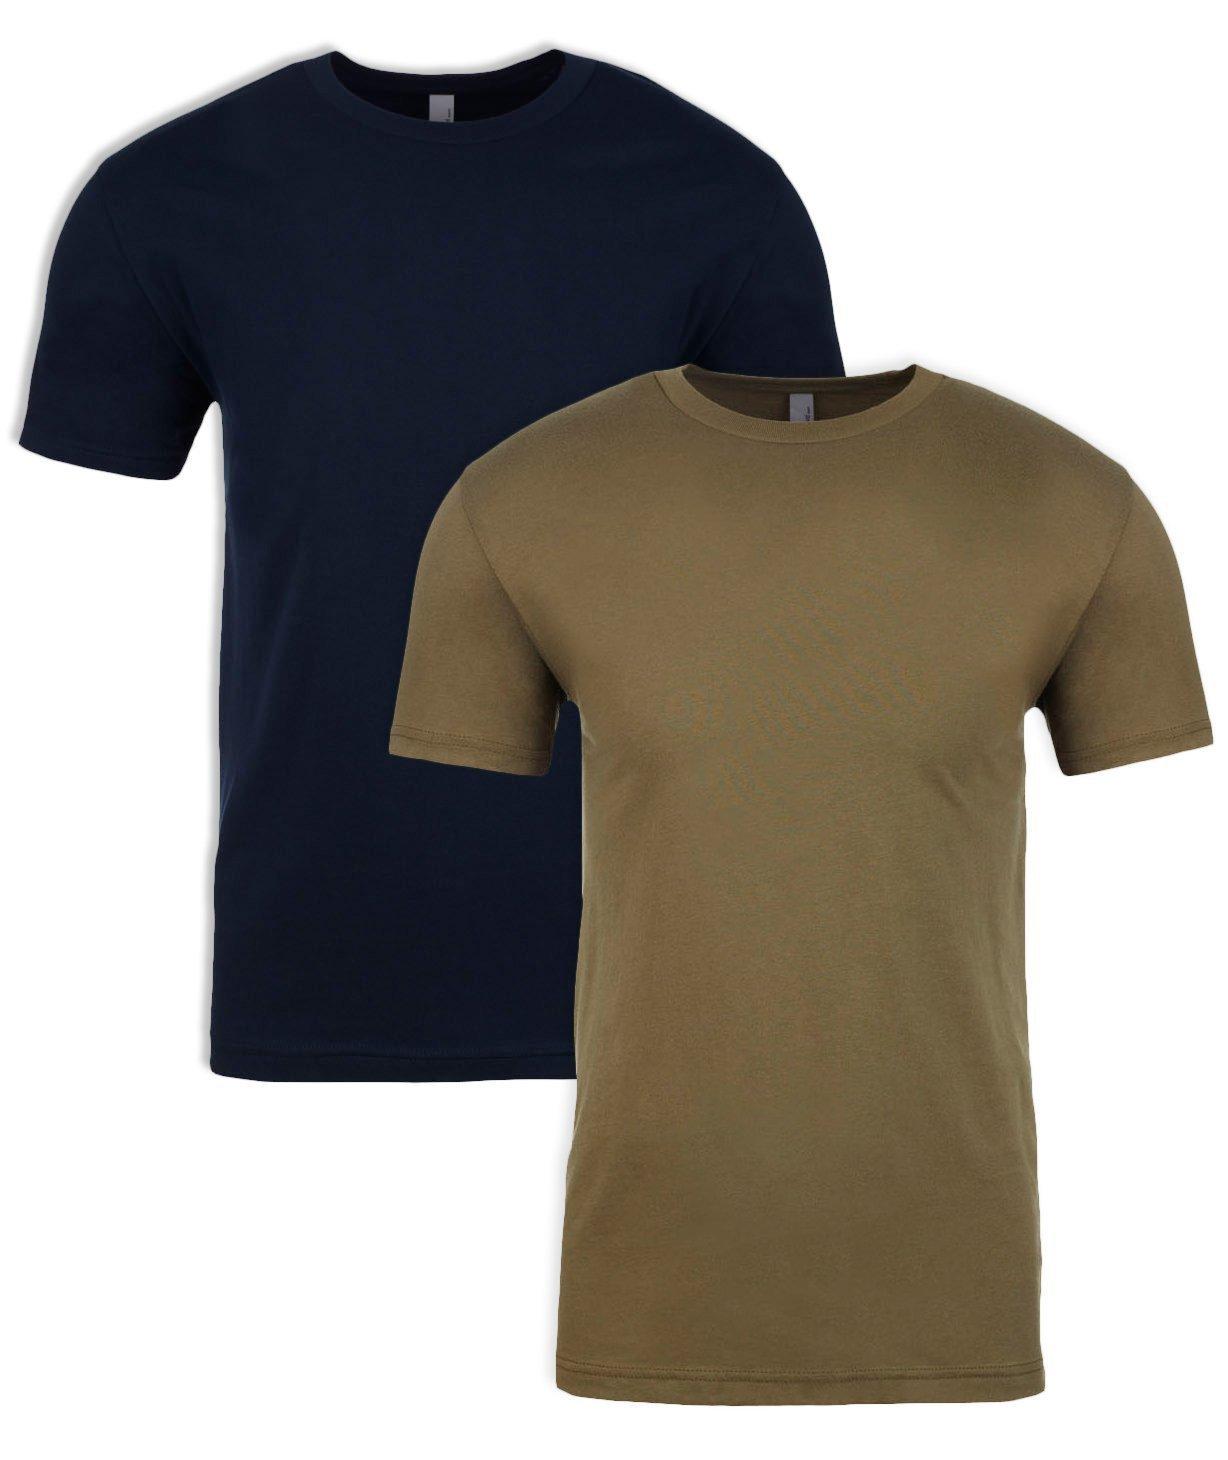 Next Level N6210 T-Shirt, Midnight + Military Green (2 Pack), Medium